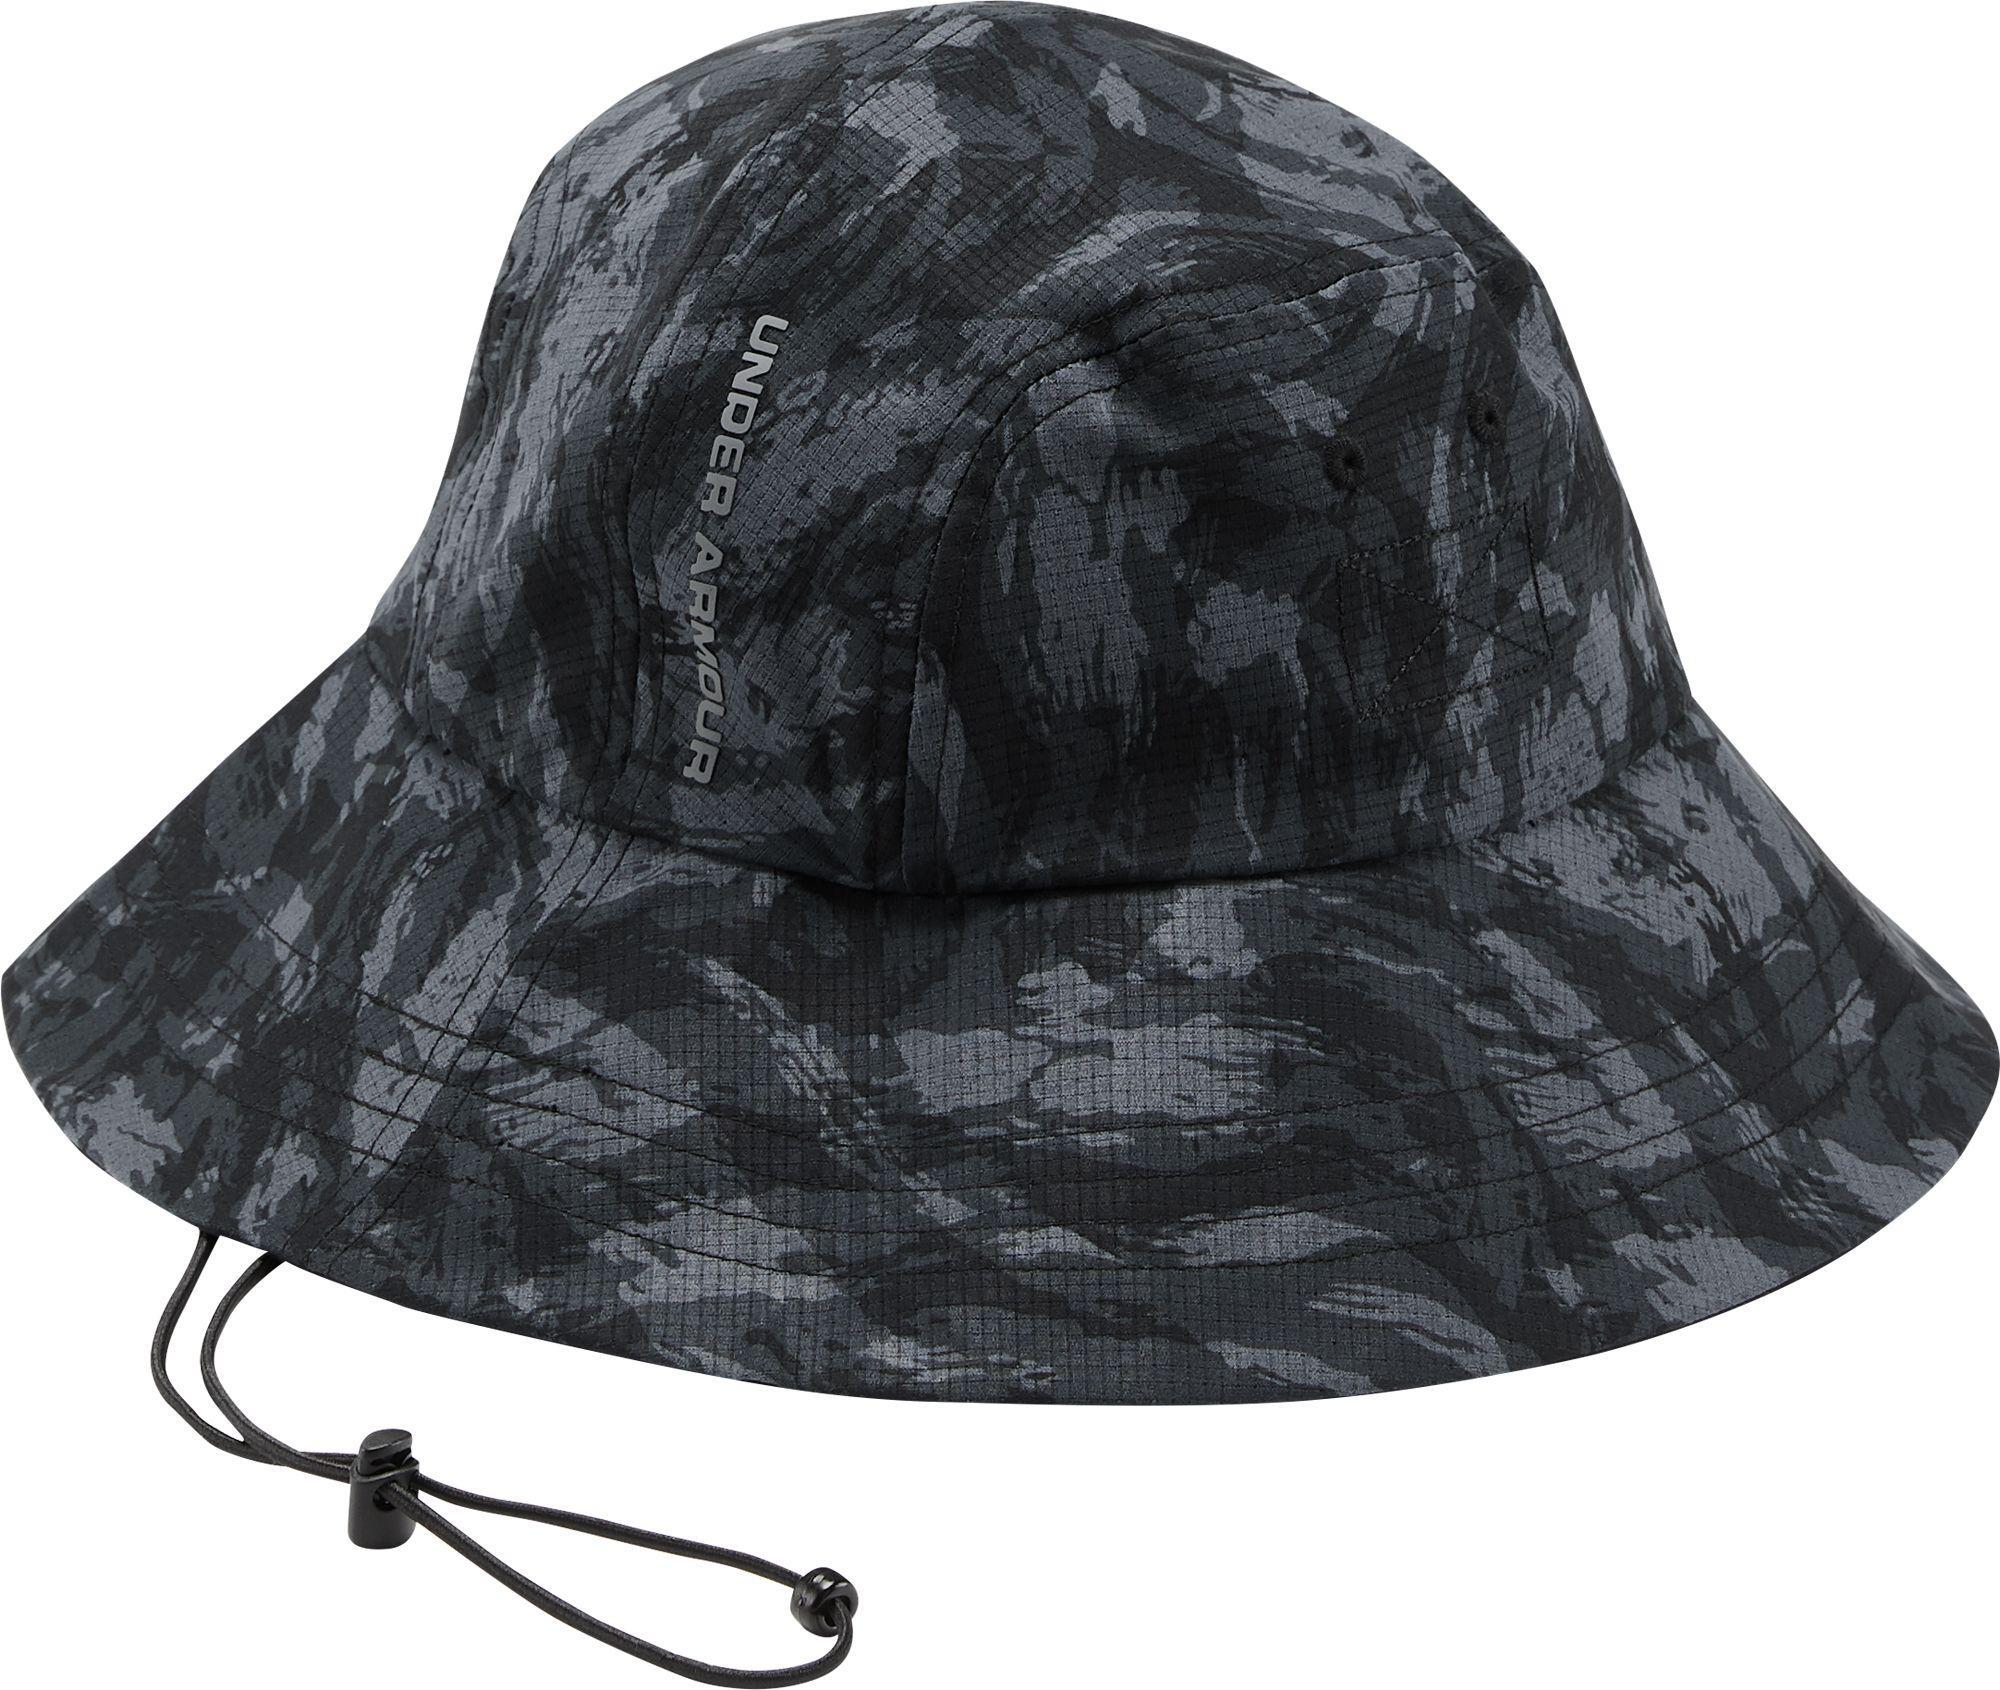 790bc582541 Lyst - Under Armour Armourvent Warrior 2.0 Bucket Hat in Black for Men